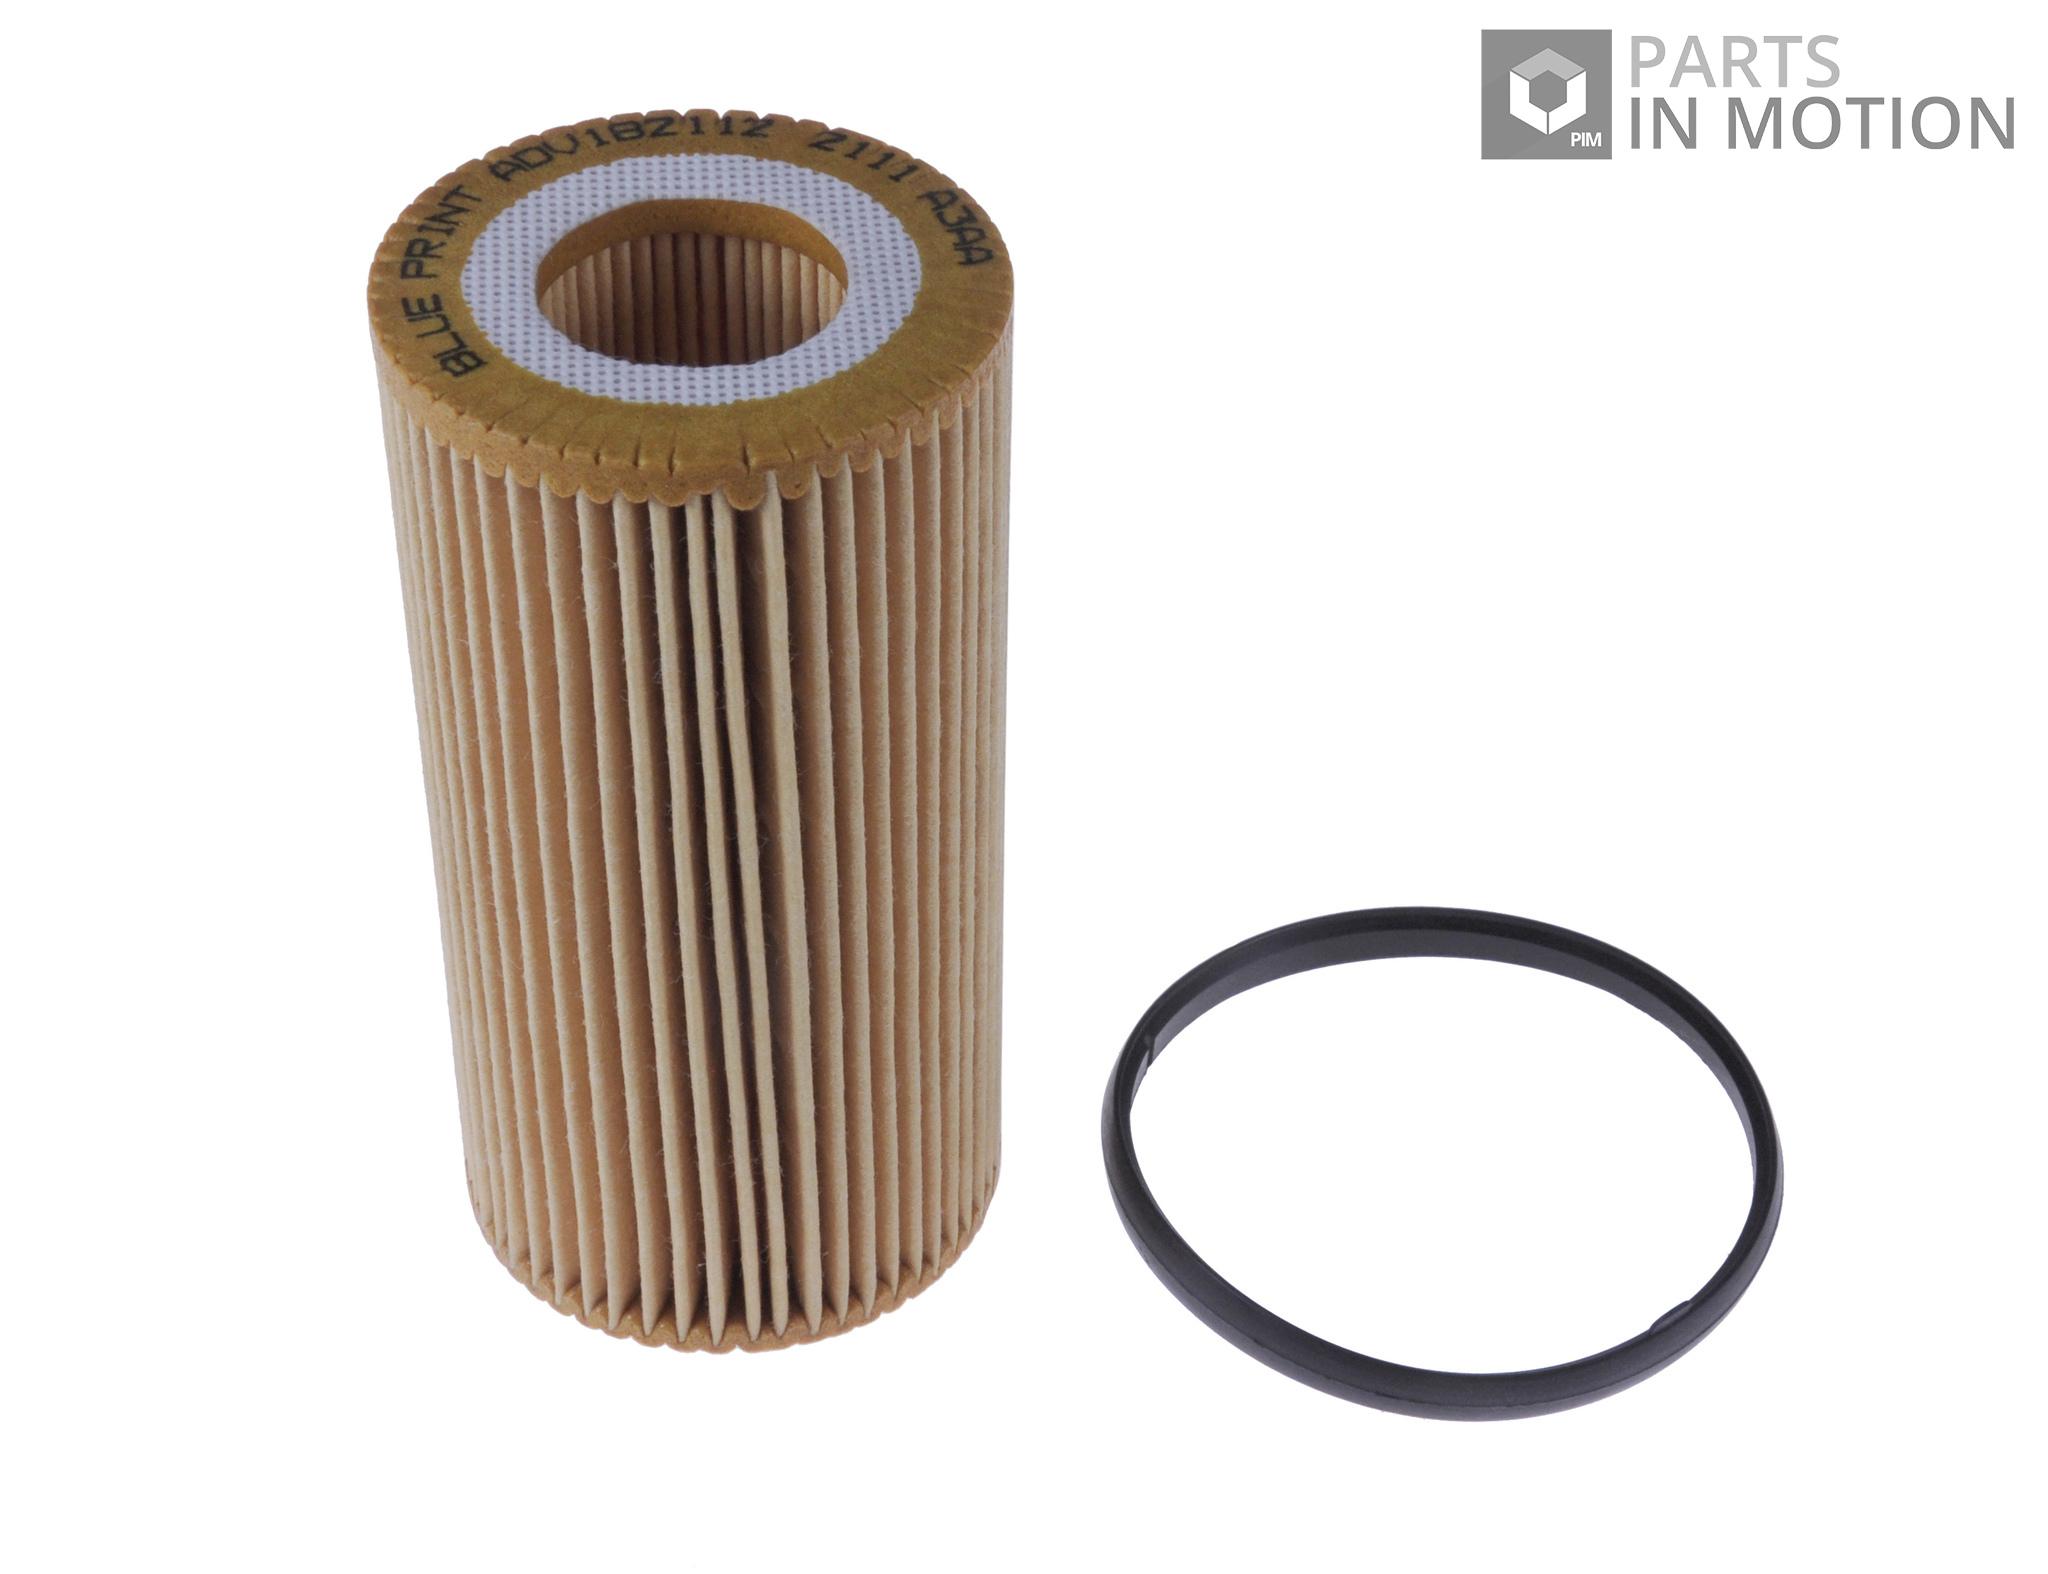 Original MEYLE Filtre à huile AUDI VW SEAT SKODA 100 115 0016